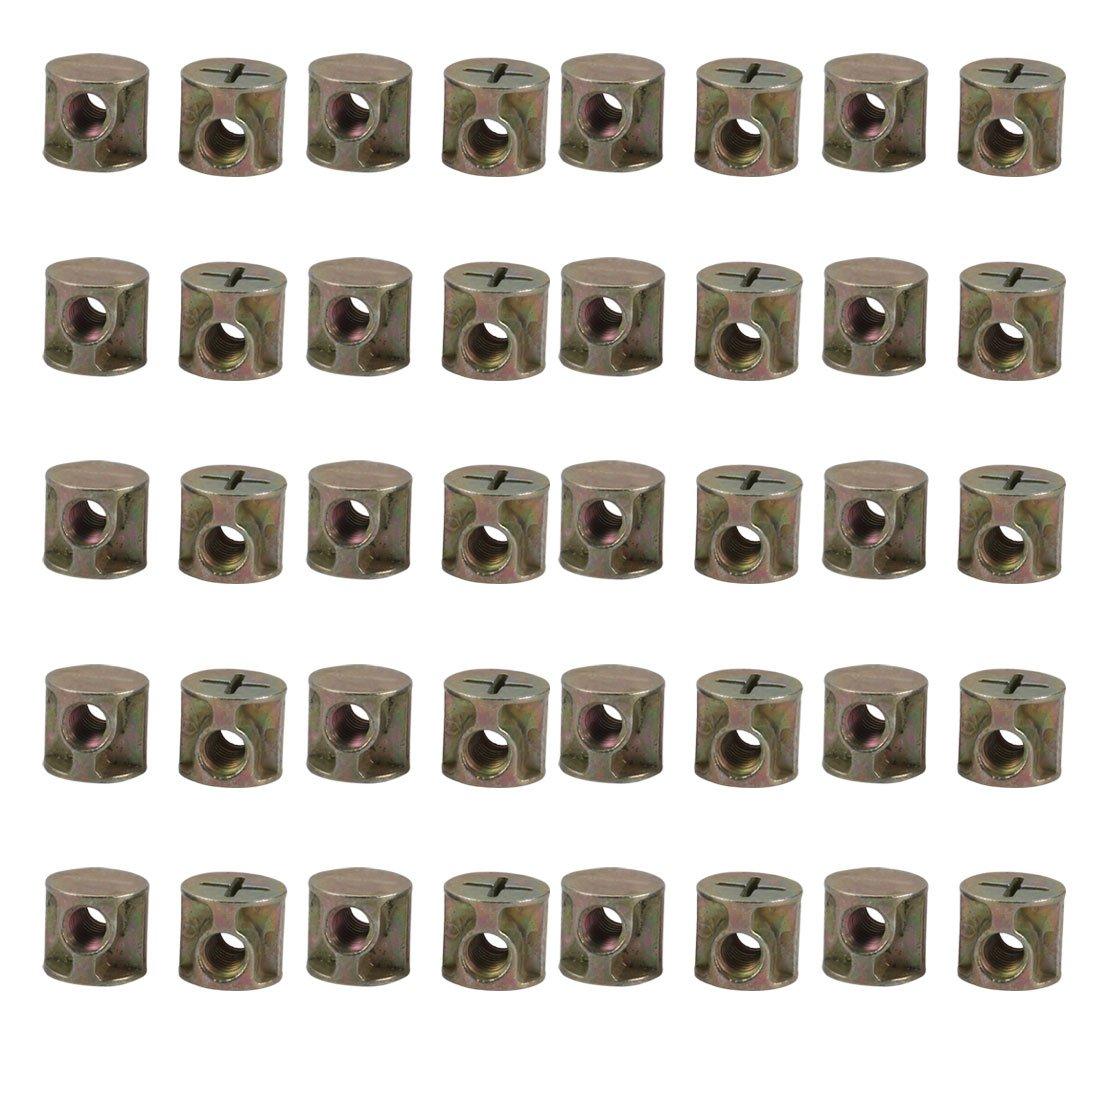 uxcell 40pcs M6 Thread 14mmx15mm Zinc Plated Iron Drive Cross Dowel Barrel Nut by uxcell